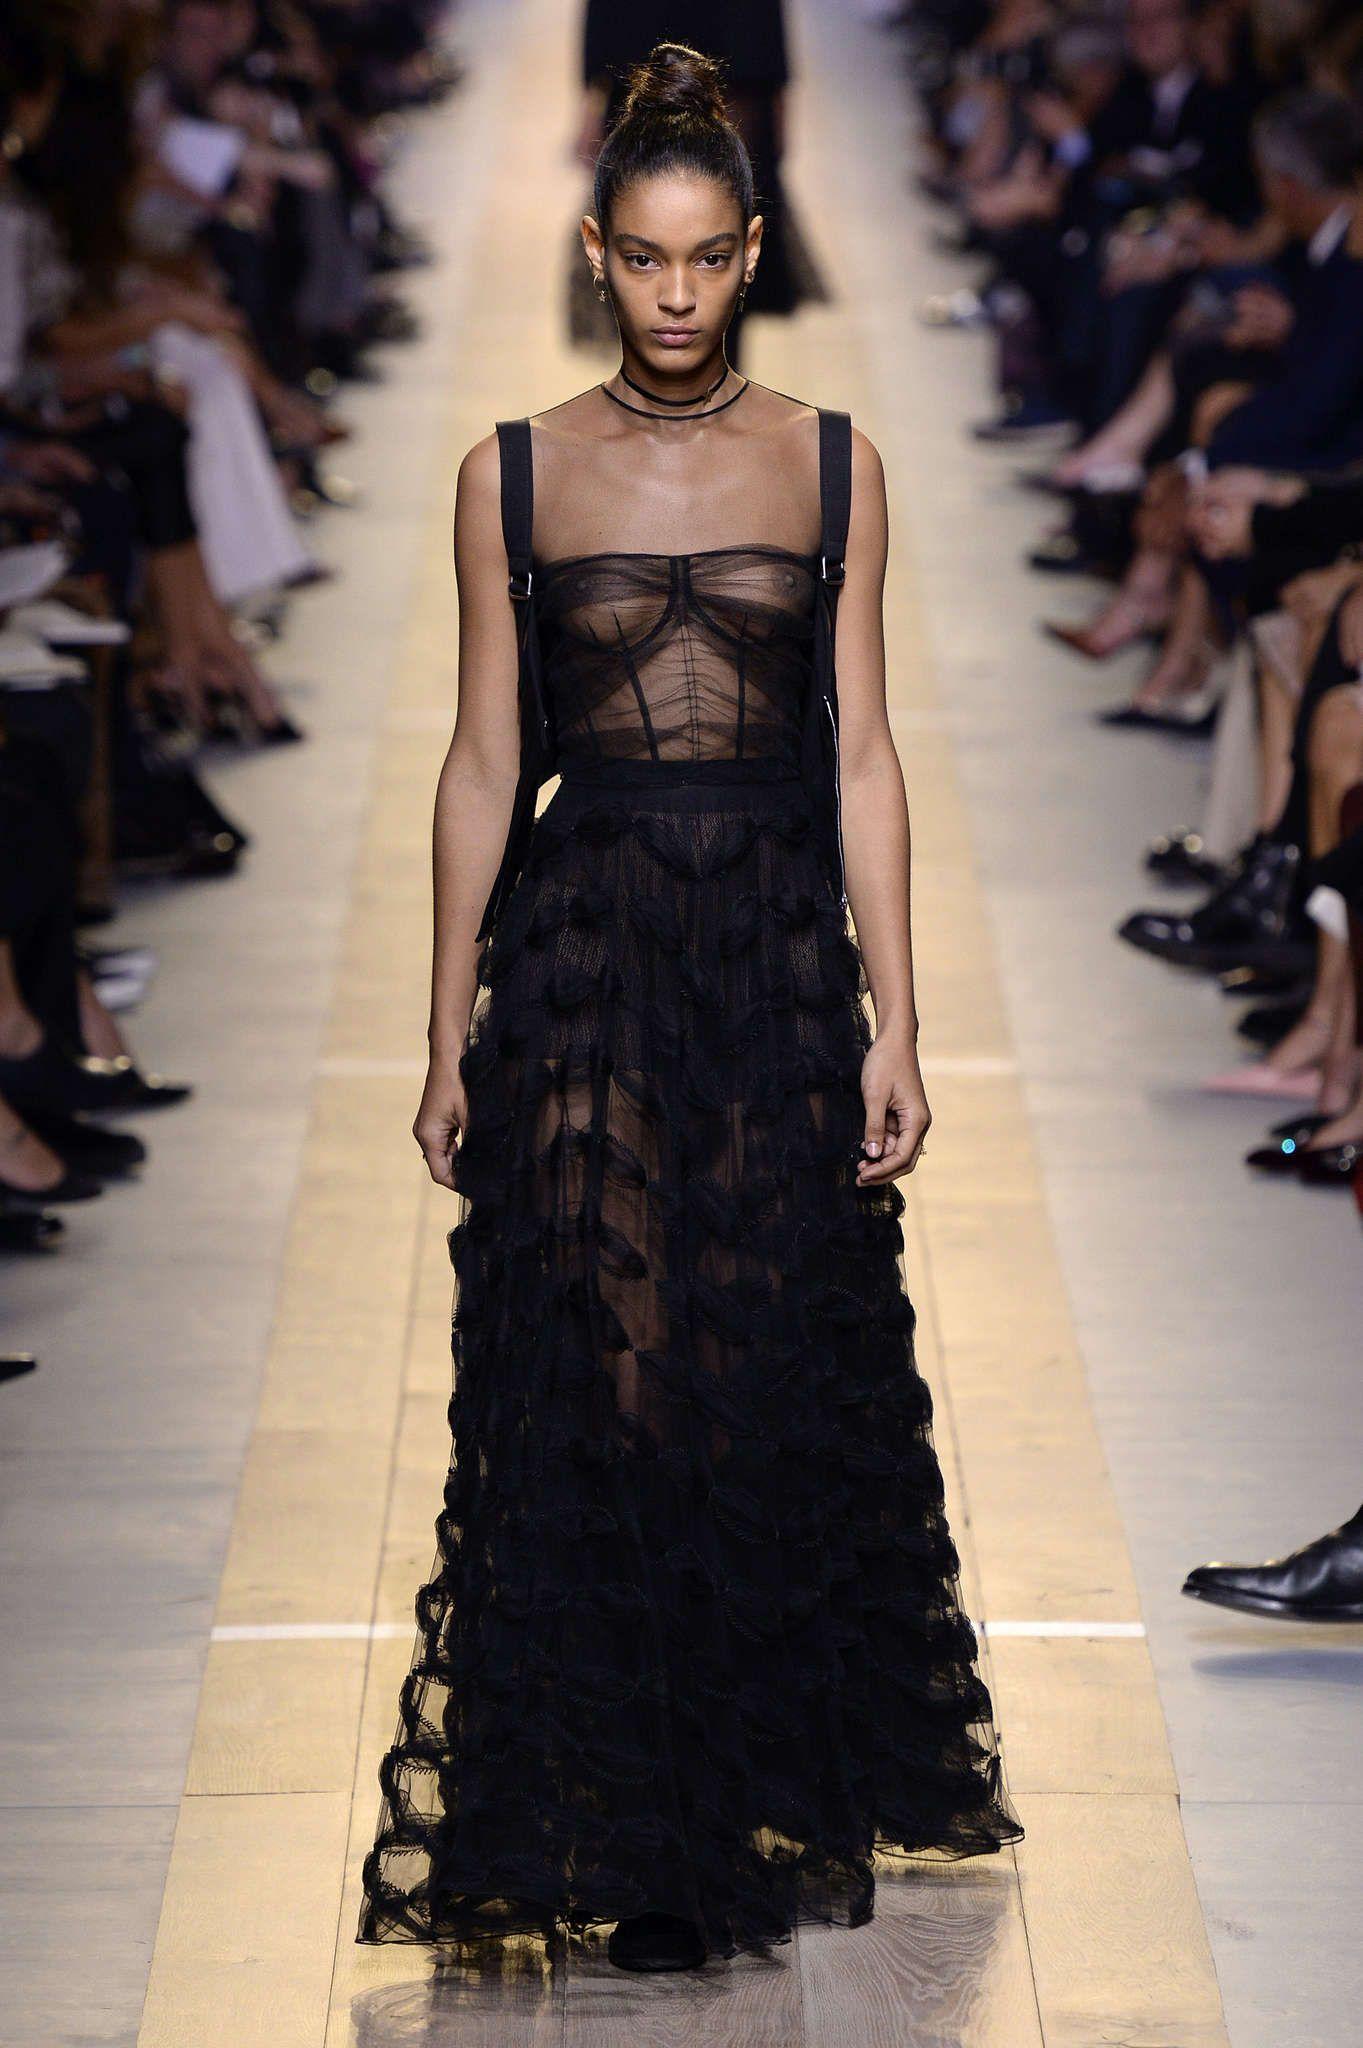 christian dior printemps et 2017 womenswear fashion. Black Bedroom Furniture Sets. Home Design Ideas